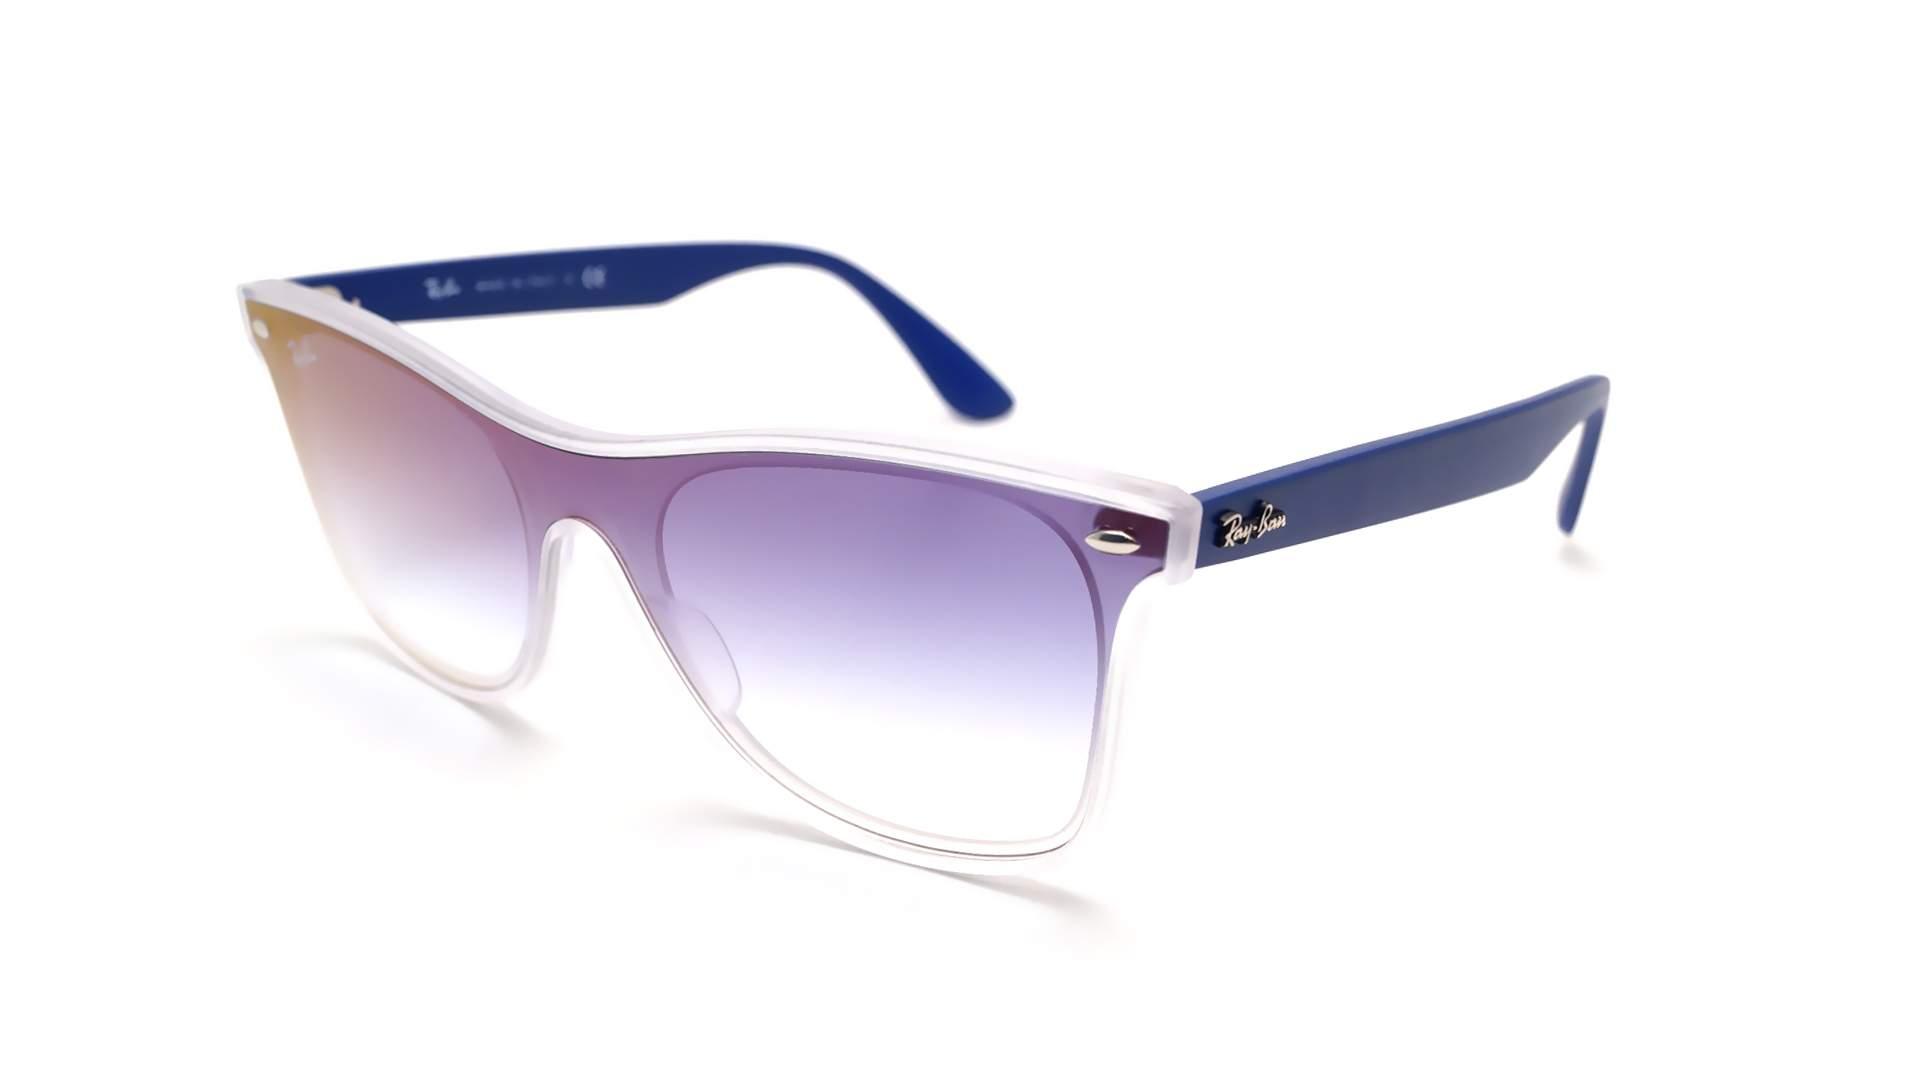 77ec655aa9 Sunglasses Ray-Ban Wayfarer Blaze Blue RB4440N 6356 X0 41-18 Medium Gradient  Mirror